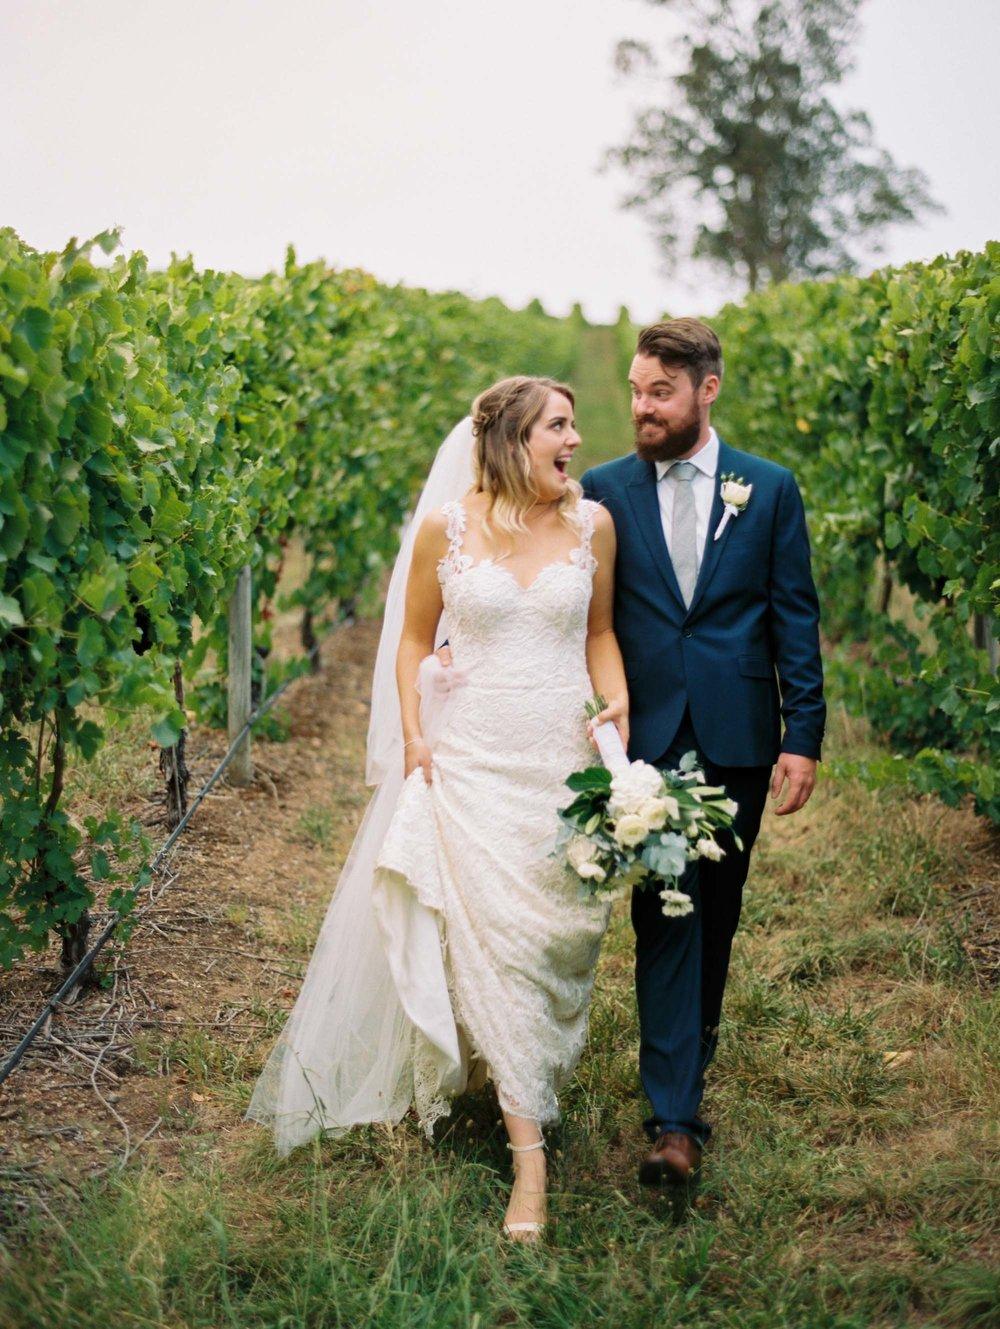 Golding-Wines-wedding-photography-085.jpg